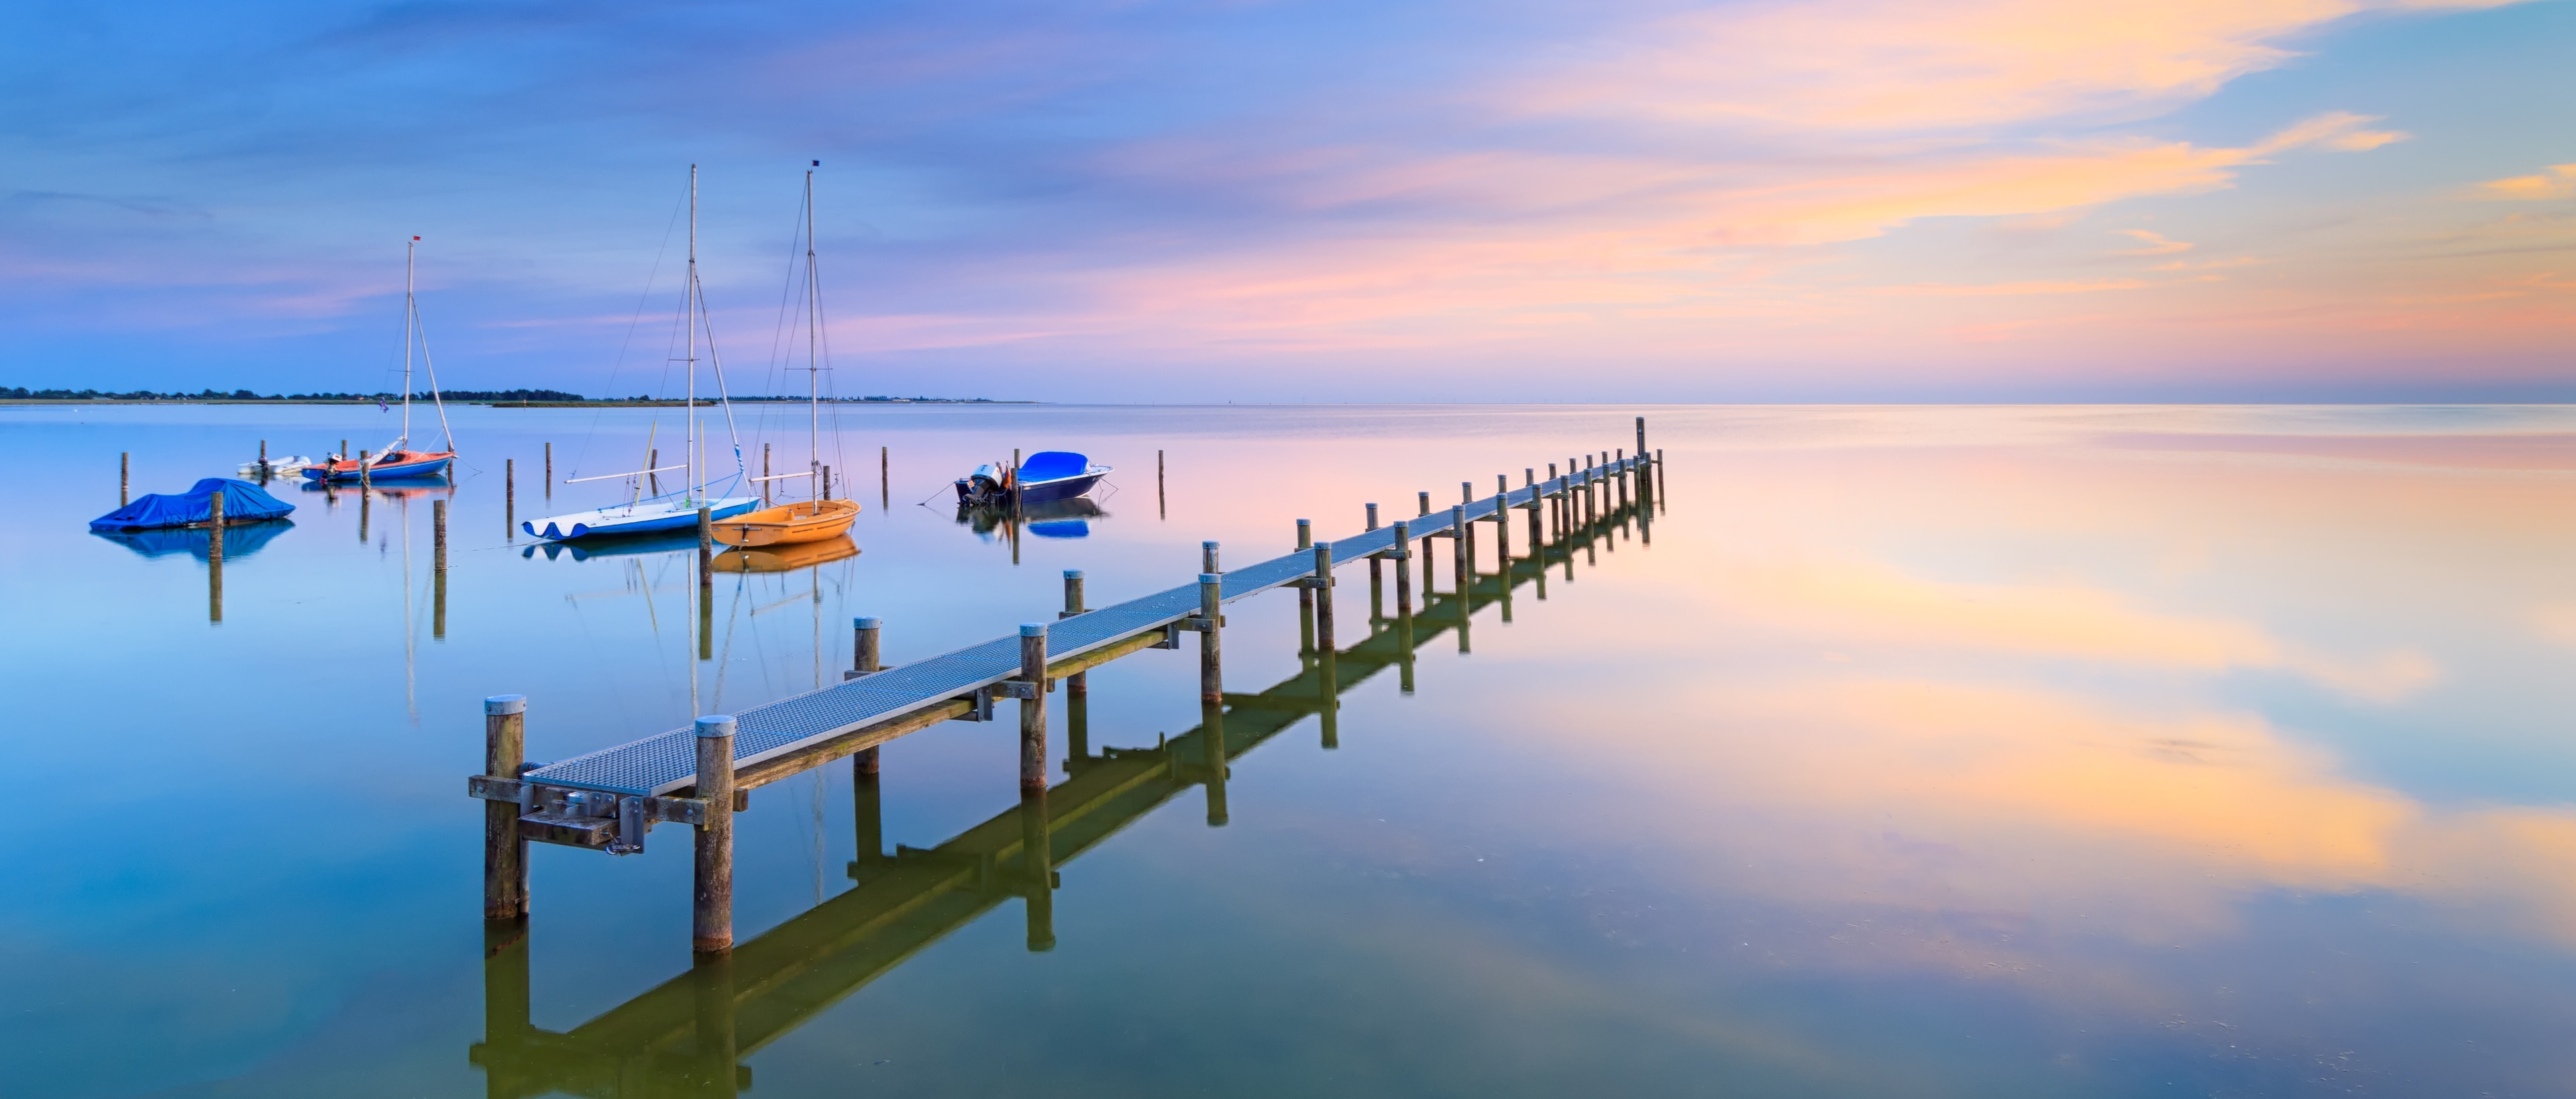 IJsselmeer, Nederland